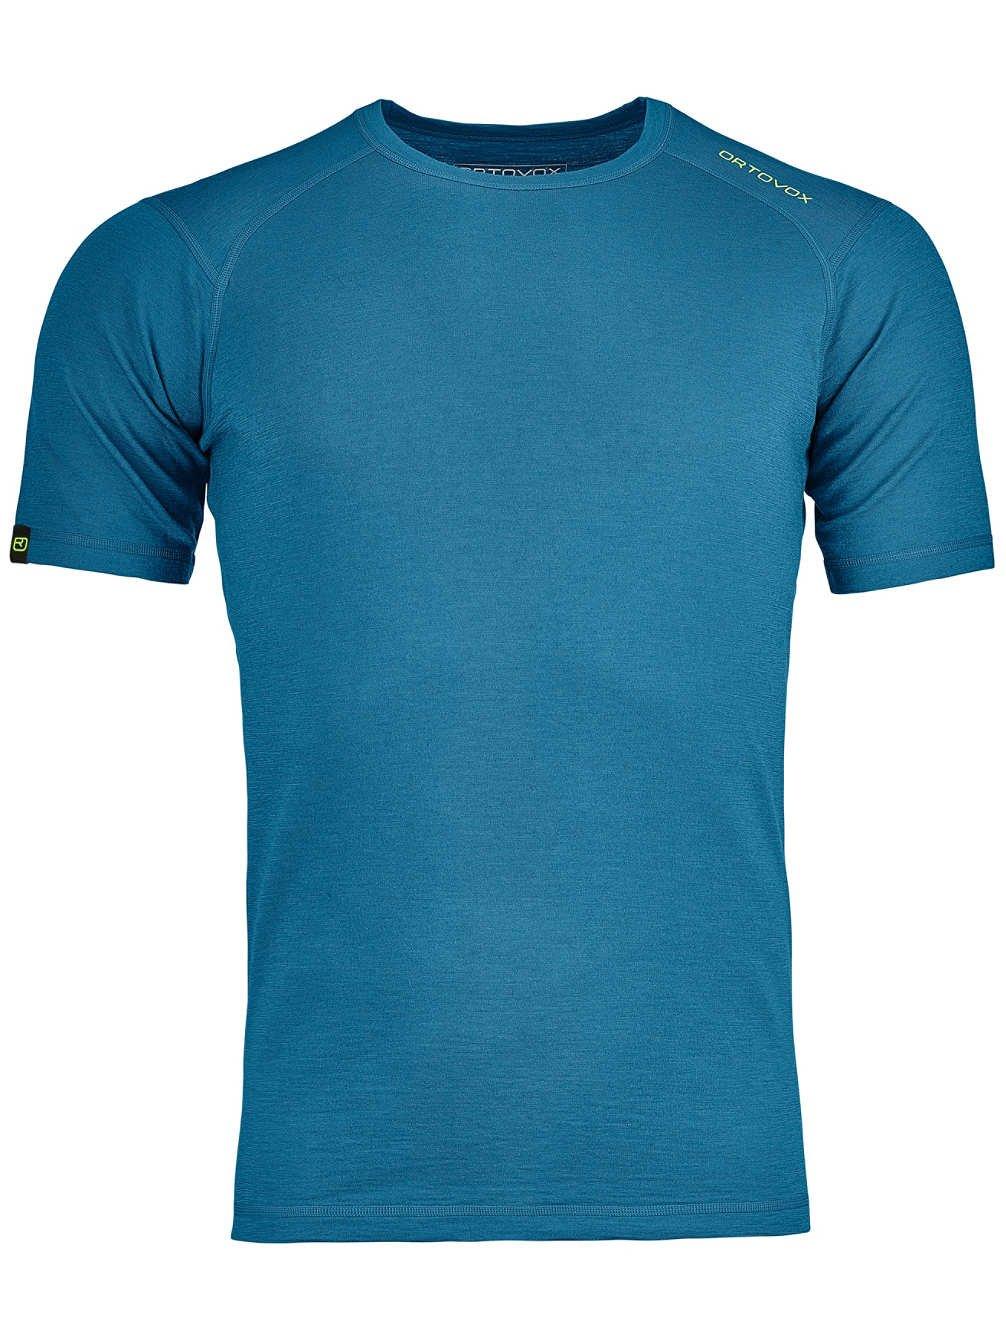 Ortovox s-Sleeve 145 Ultra s-Sleeve Ortovox M Thermo-Shirt, Herren ce27bd